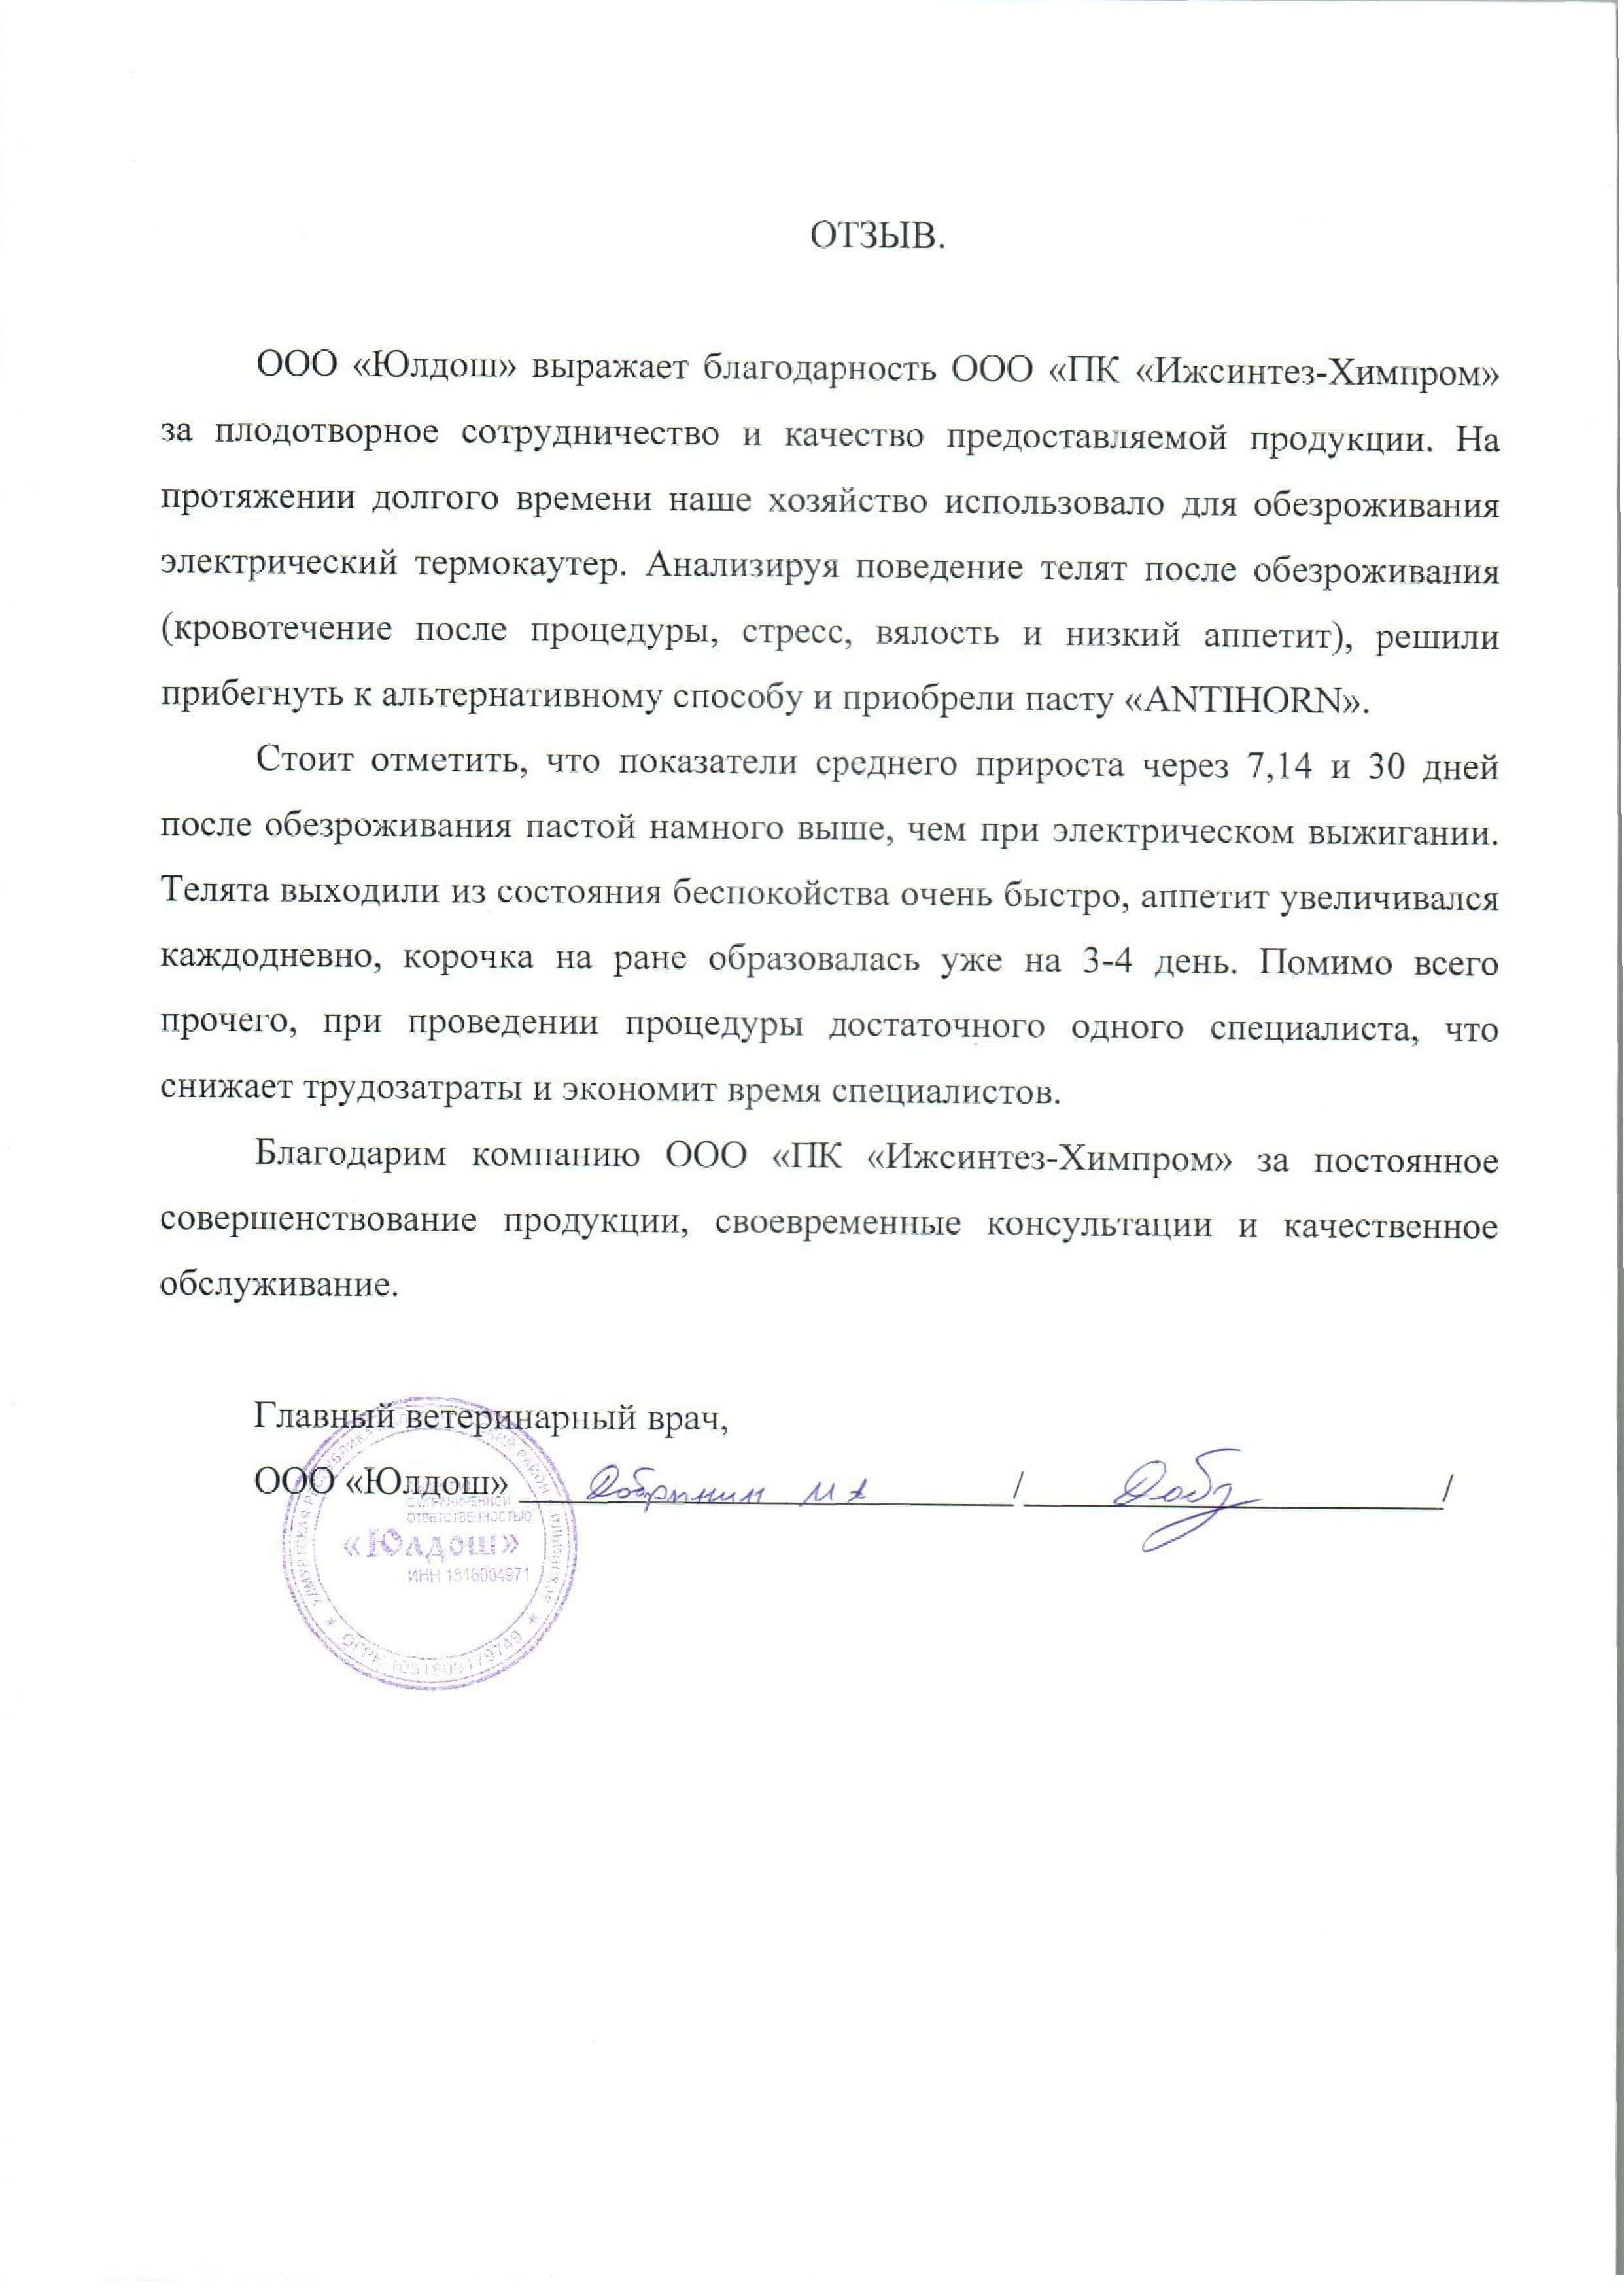 yuldosh_1